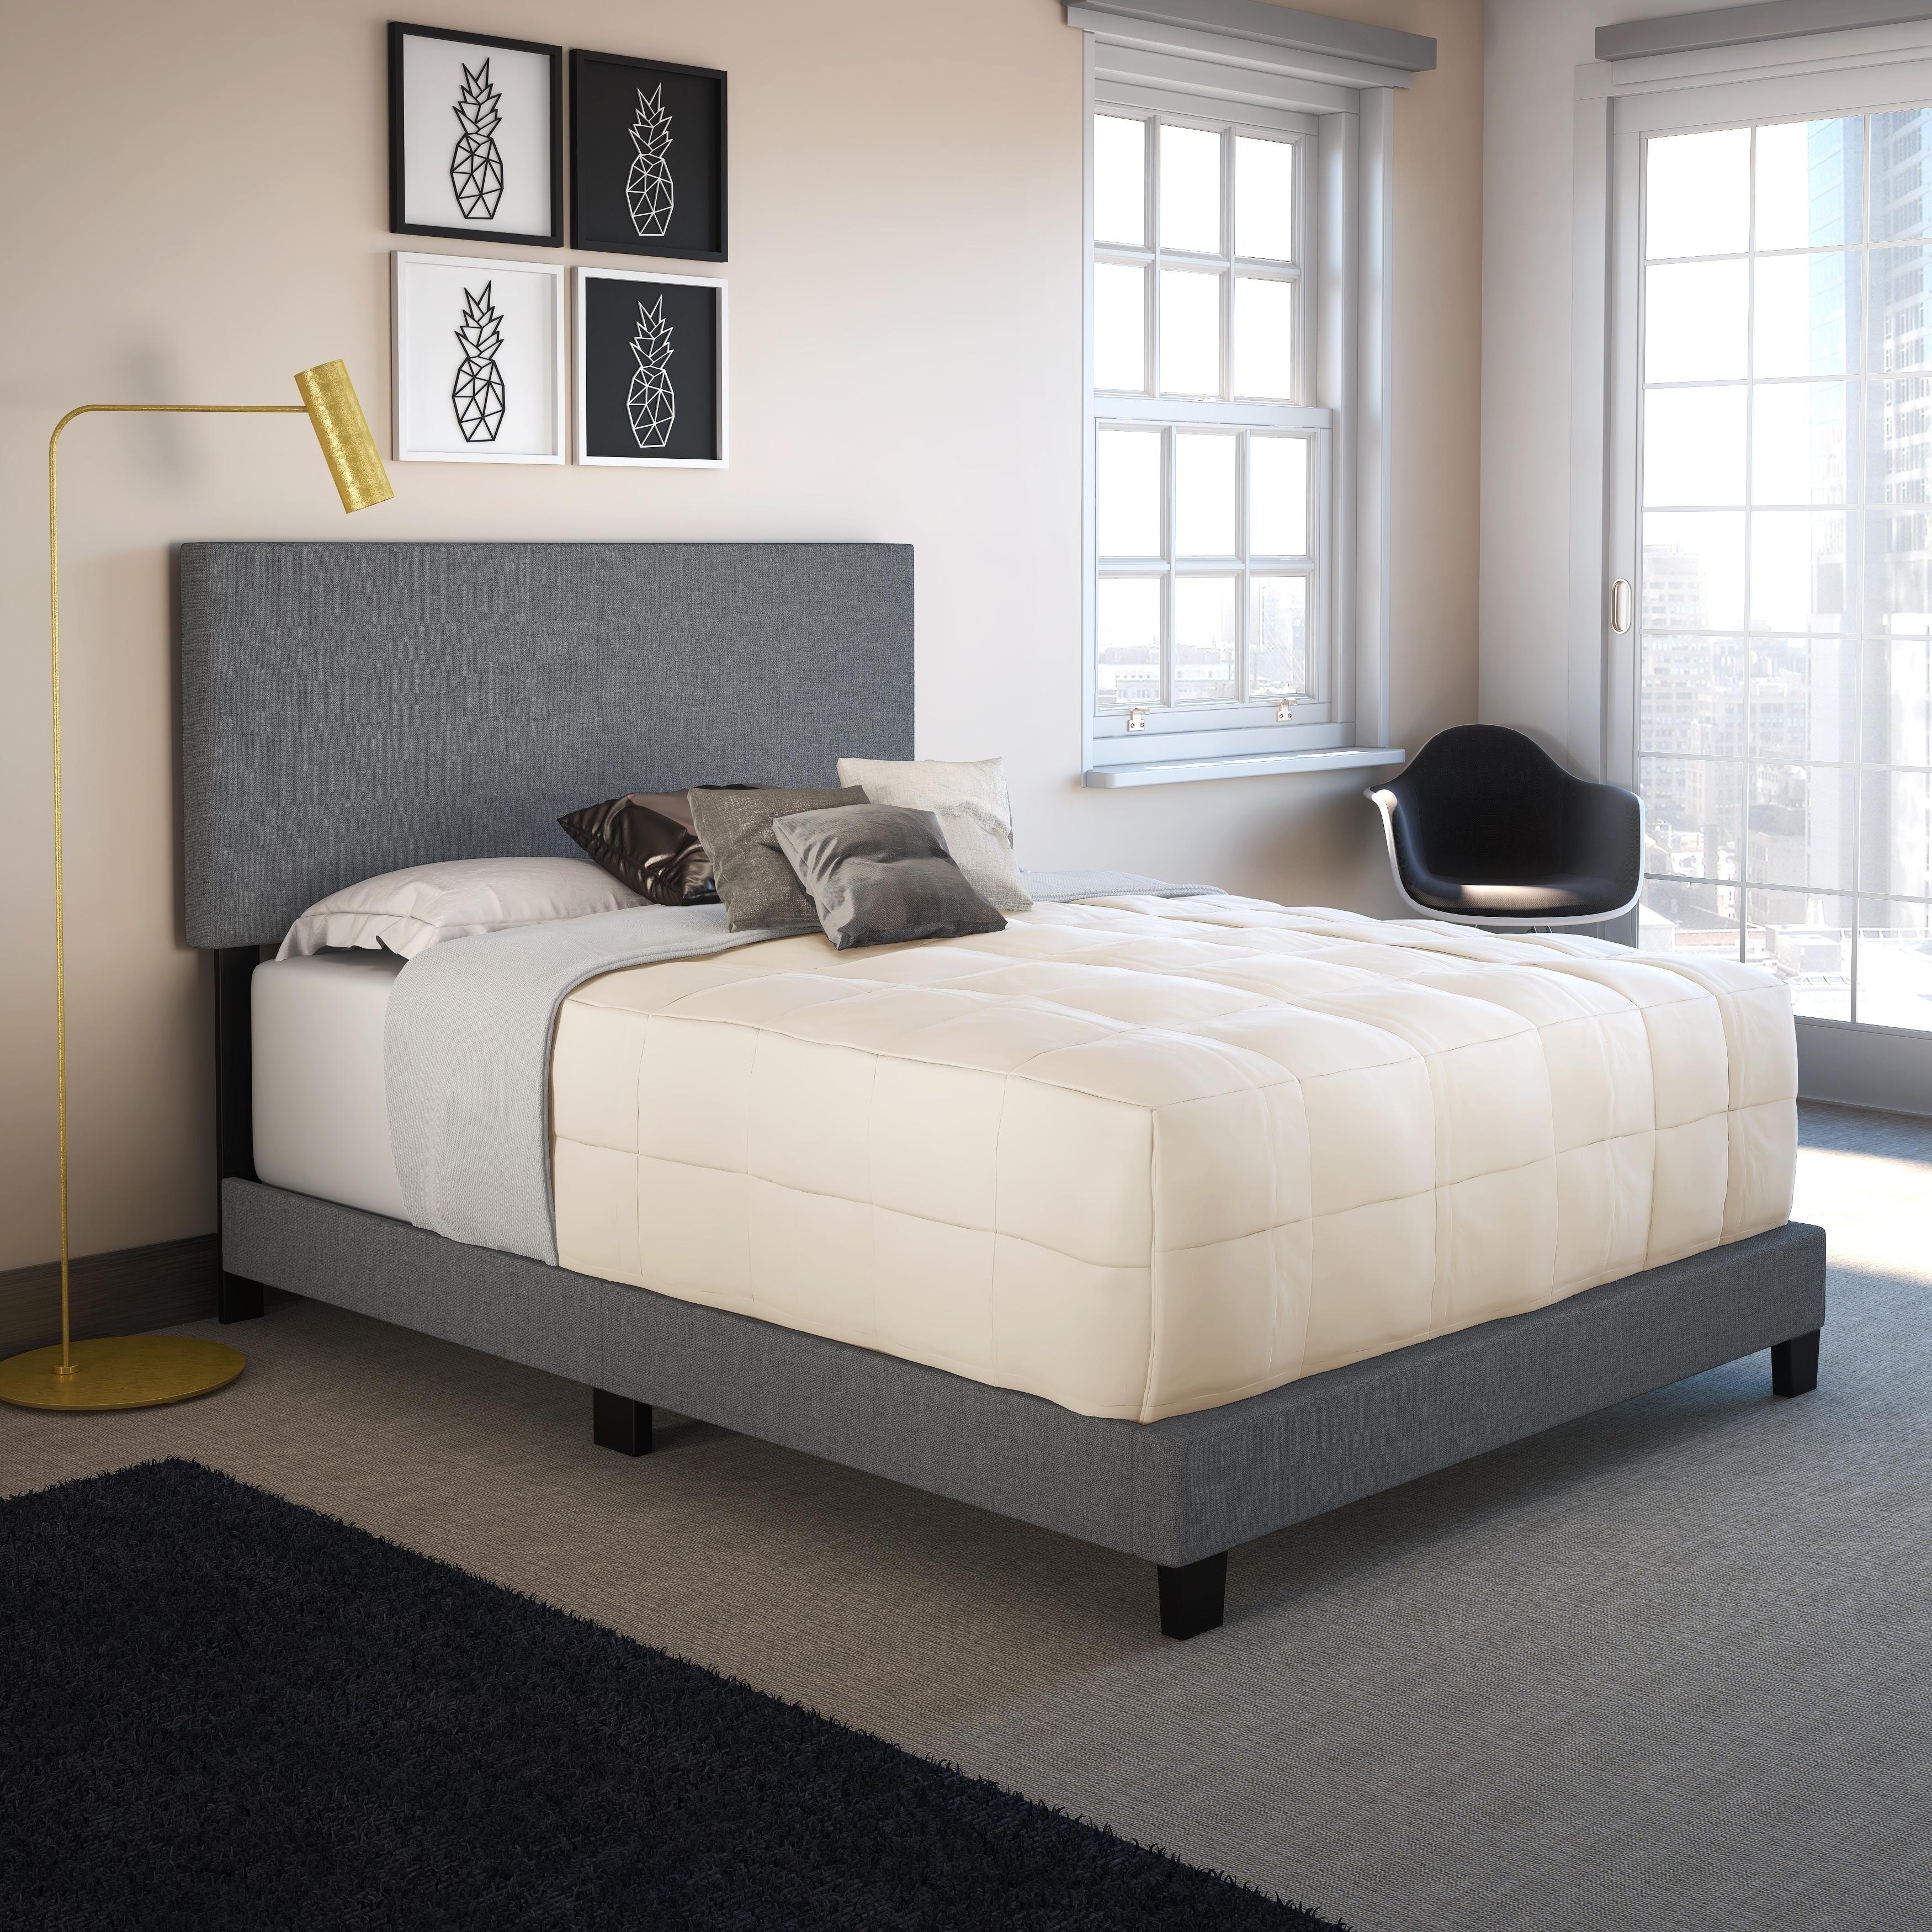 Upholstered platform bed frame Queen Sleep Sync Tivoli Grey Linen Upholstered Platform Bed Frame In Three Sizes Amazoncom Shop Sleep Sync Tivoli Grey Linen Upholstered Platform Bed Frame In